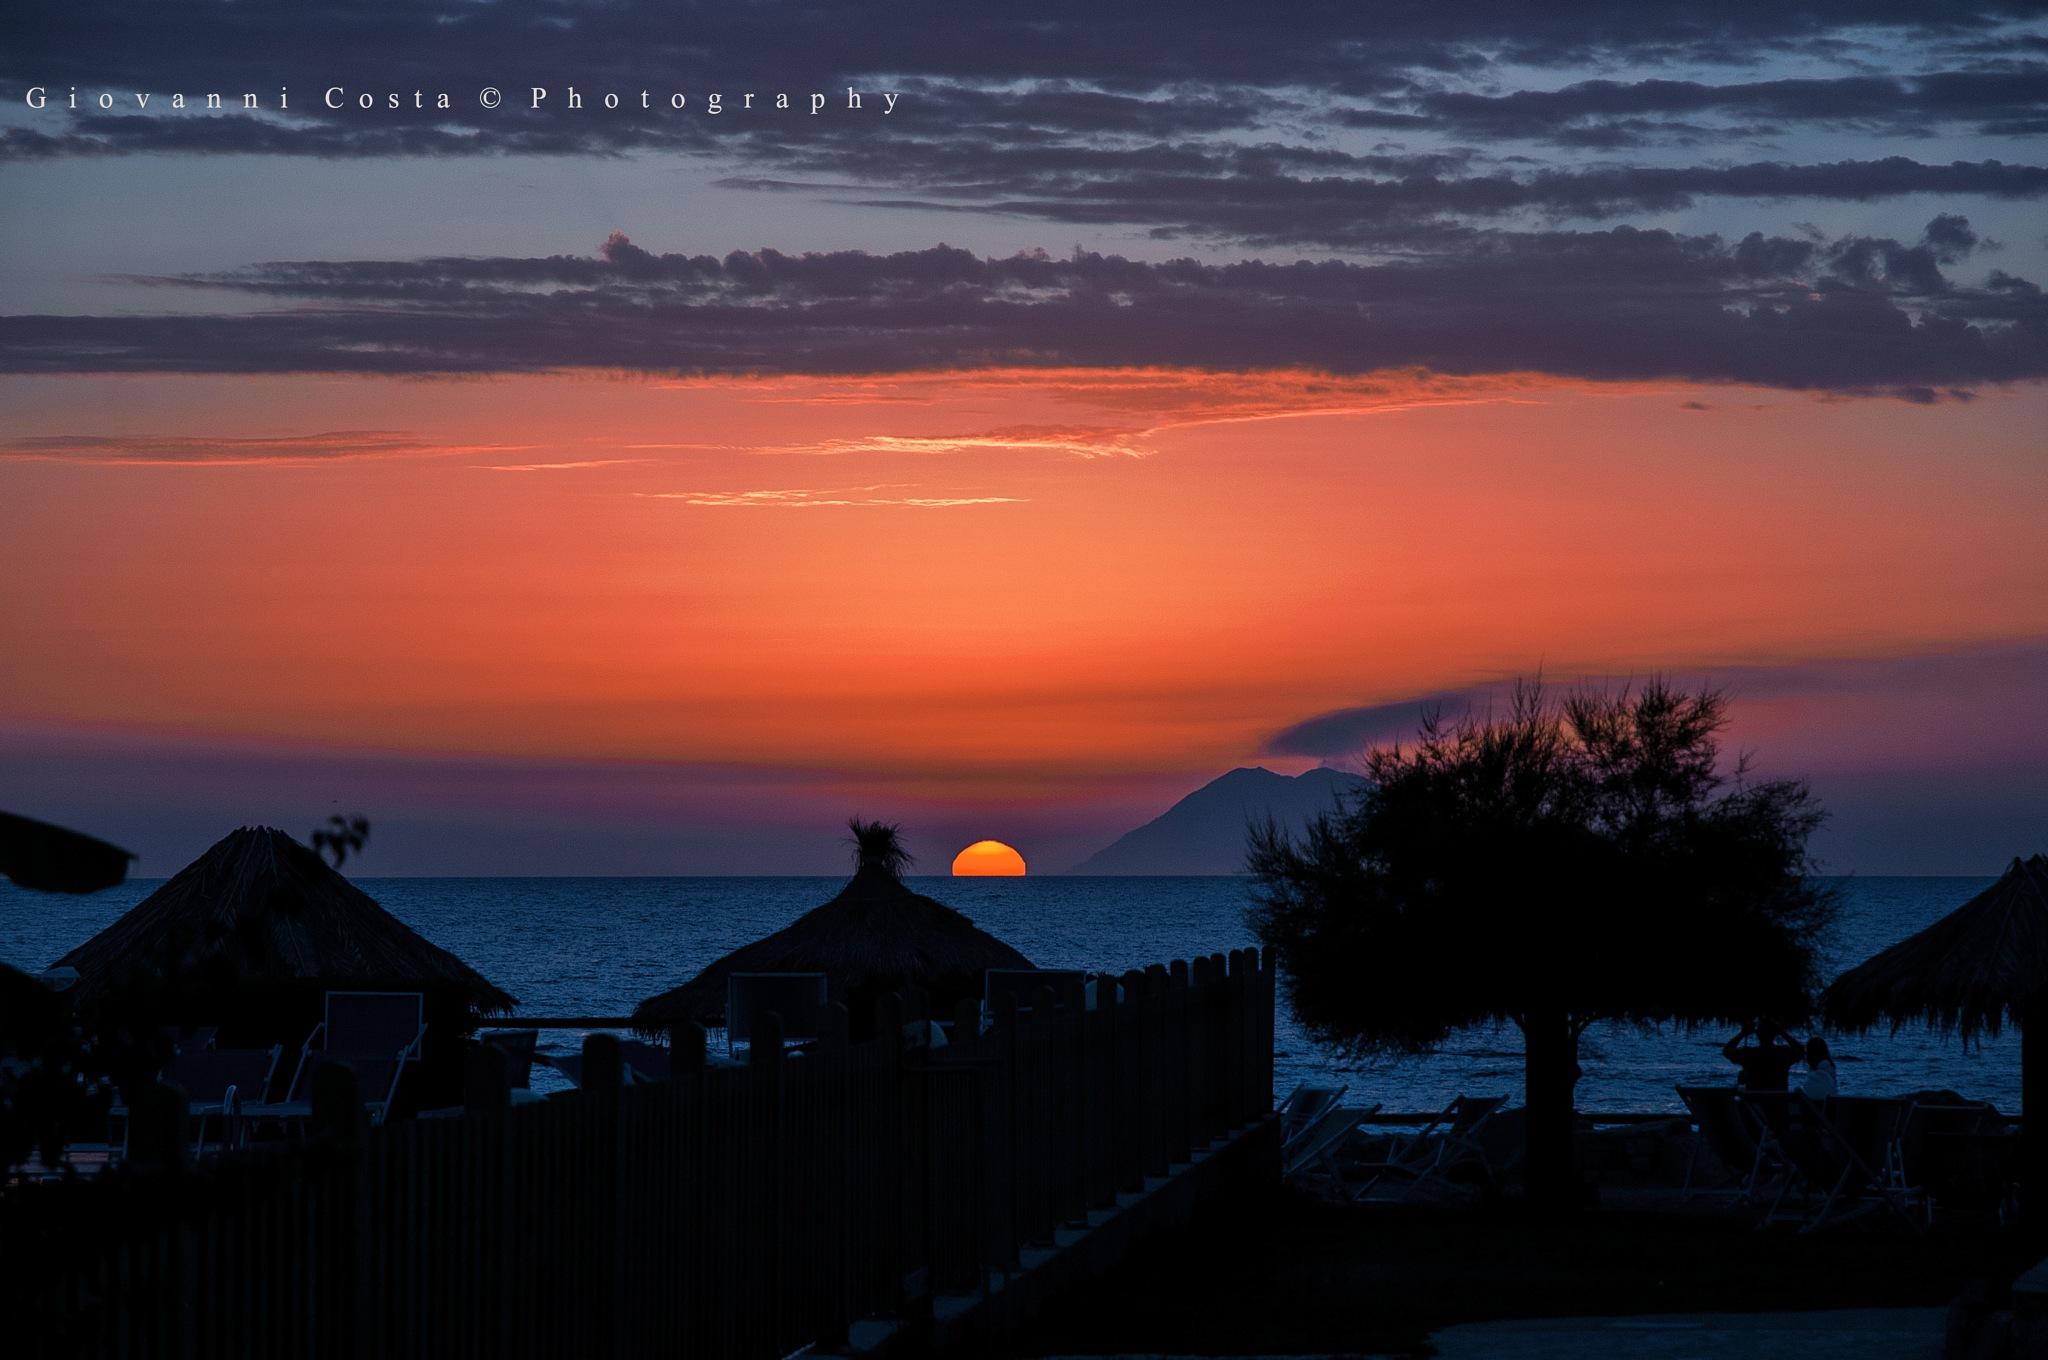 Sunset on Stromboli by GiovanniCostaPhotographer